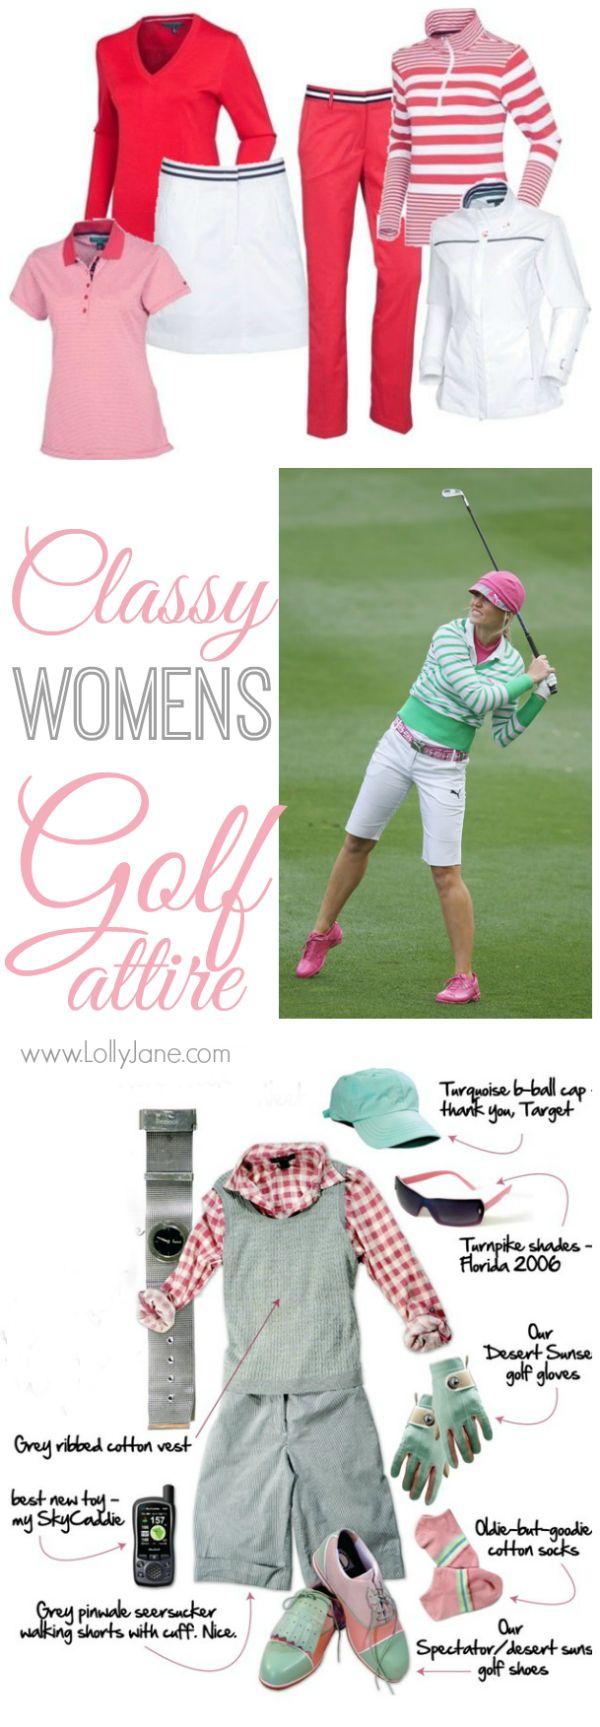 Classy Womens Golf Attire |lollyjane.com